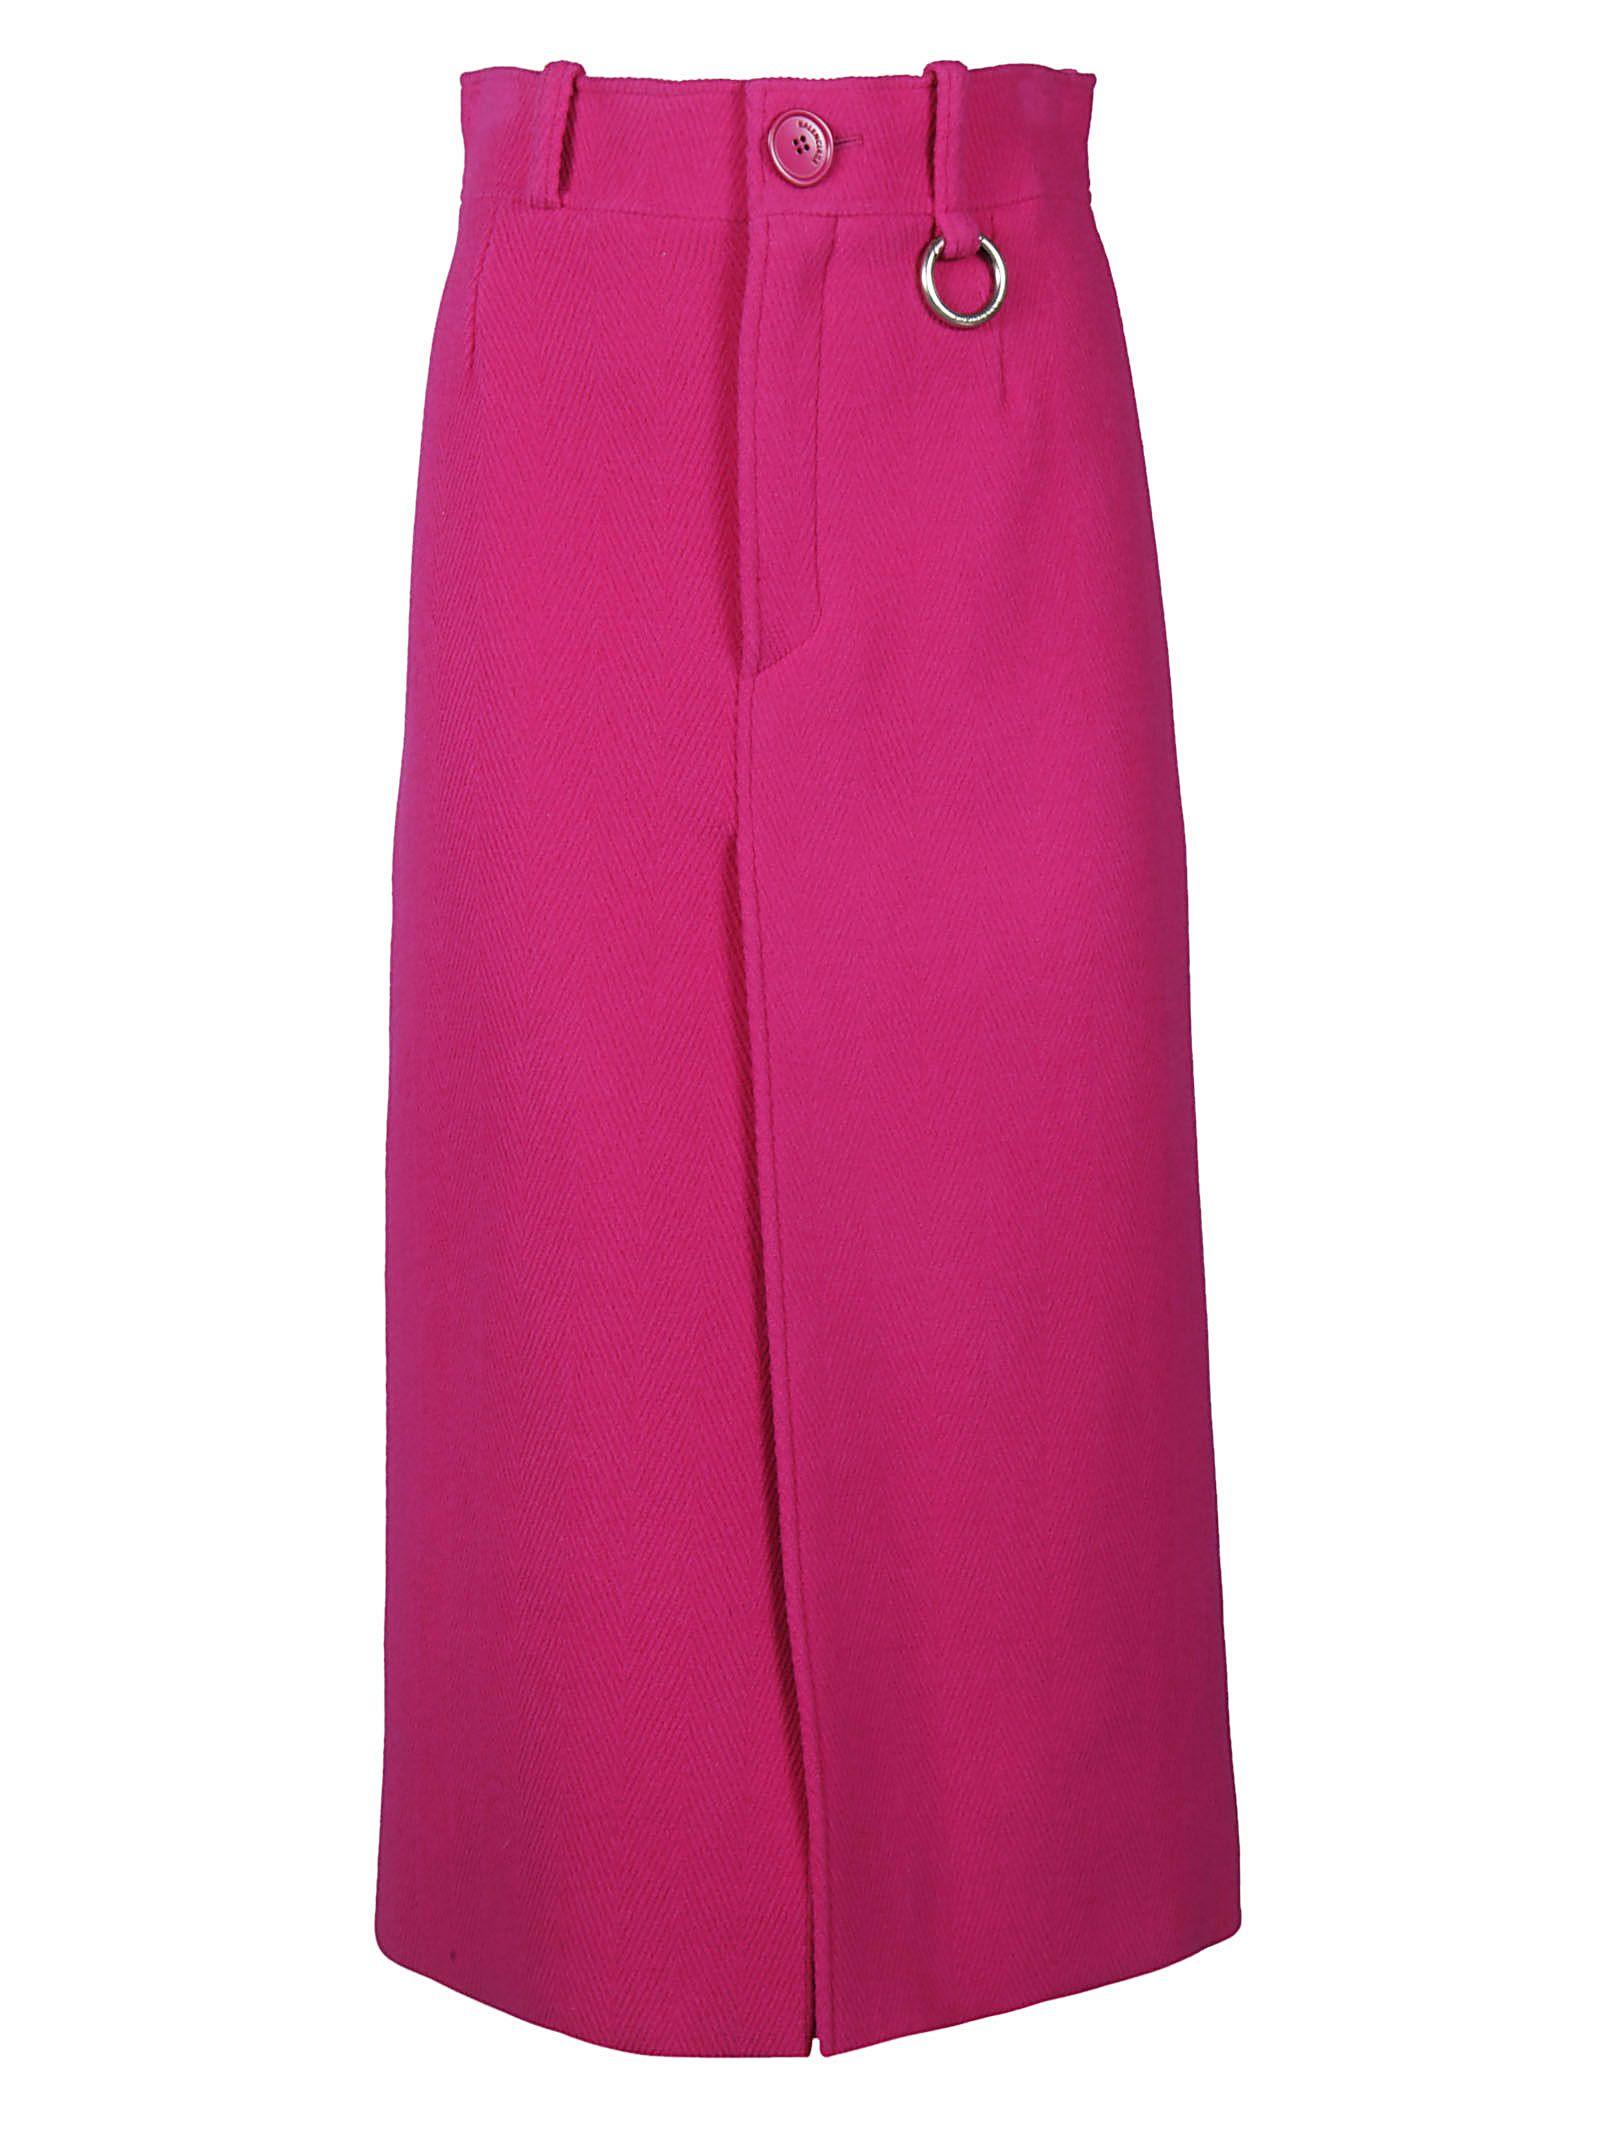 balenciaga -  Ring Detail Skirt